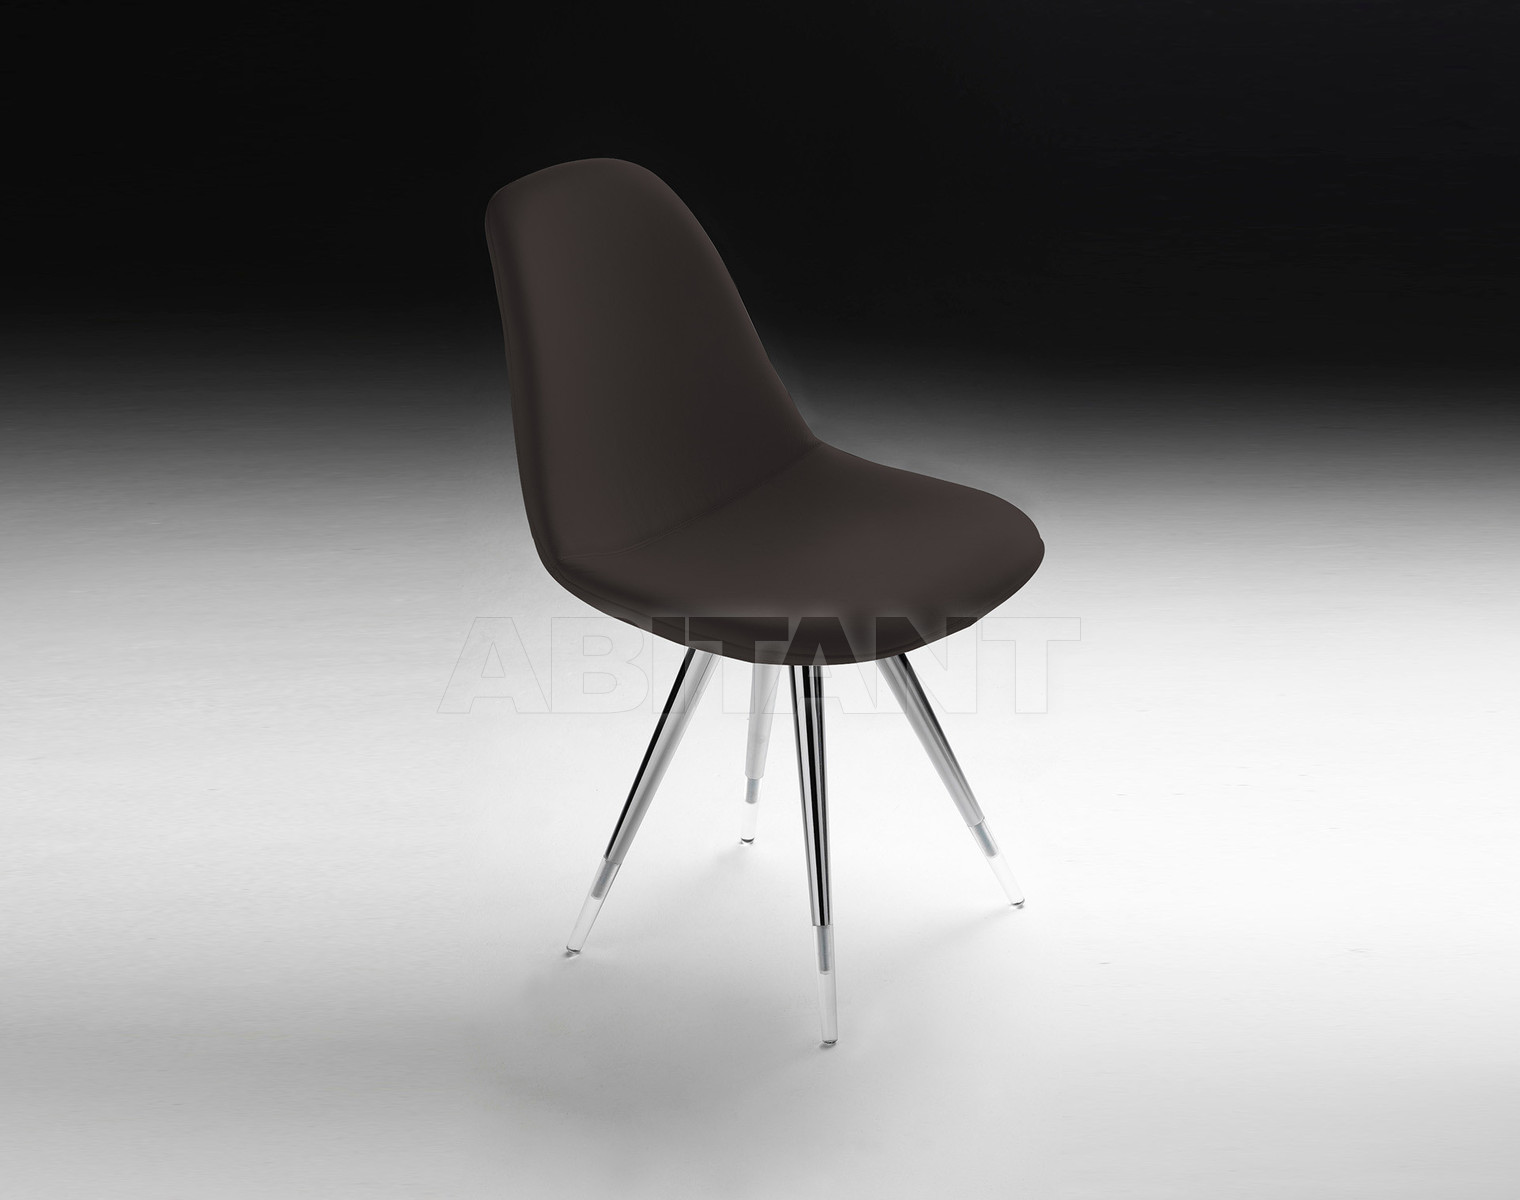 Купить Стул Kubikoff Gino Lemson & Ruud Bos Angel'POP'Chair' 04